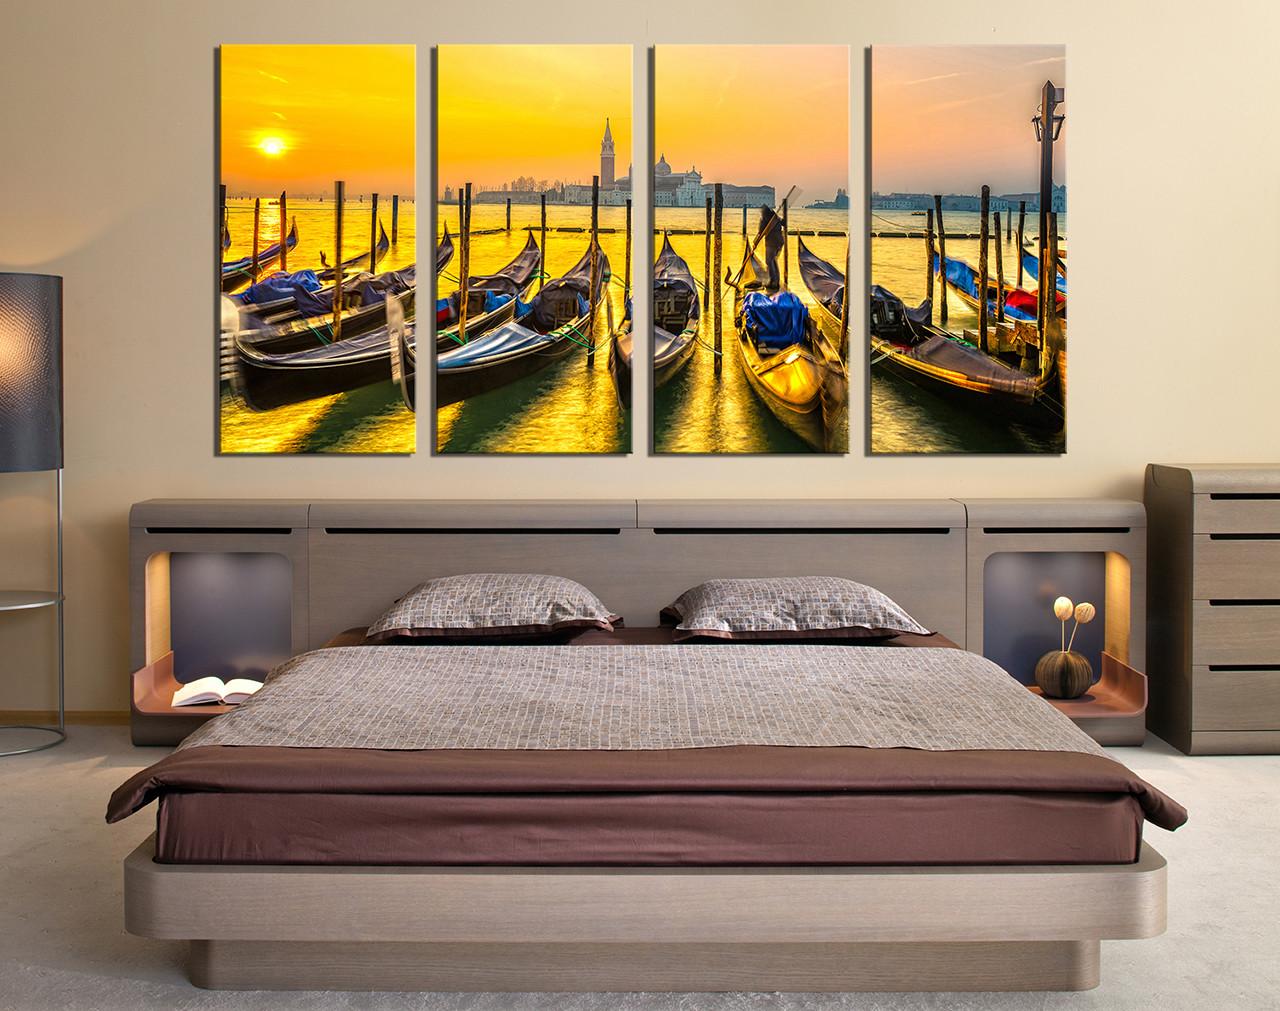 Bedroom Canvas Prints 4 piece group canvas, boat multi panel canvas, ocean huge canvas